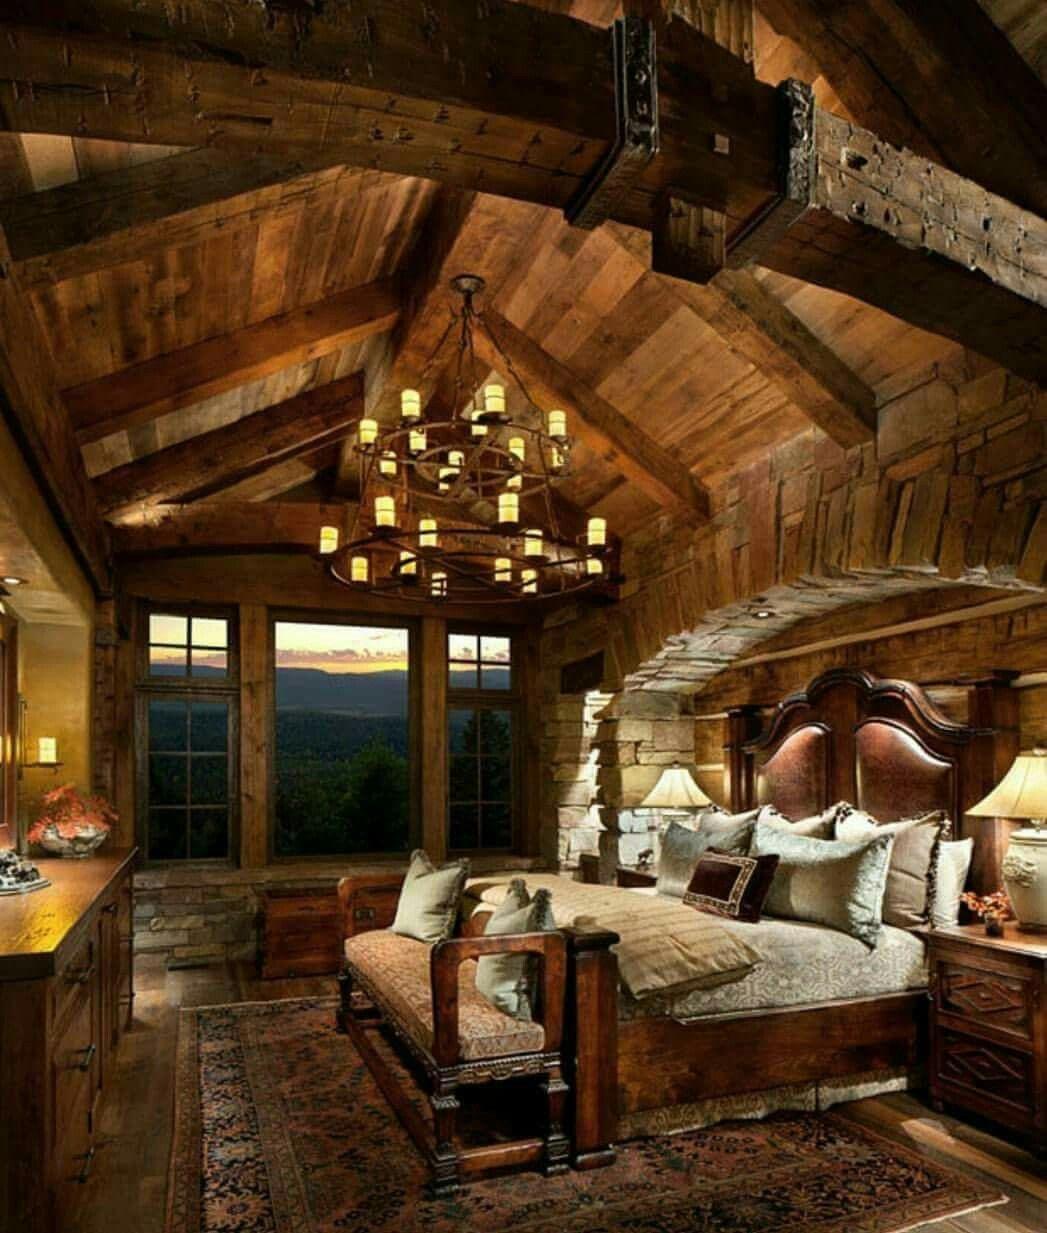 Rustic Log Cabin Bedroom Ideas House Plans In 2019 Lodge Log Cabin Bedrooms Rustic Master Bedroom Rustic House Rustic cabin bedroom ideas